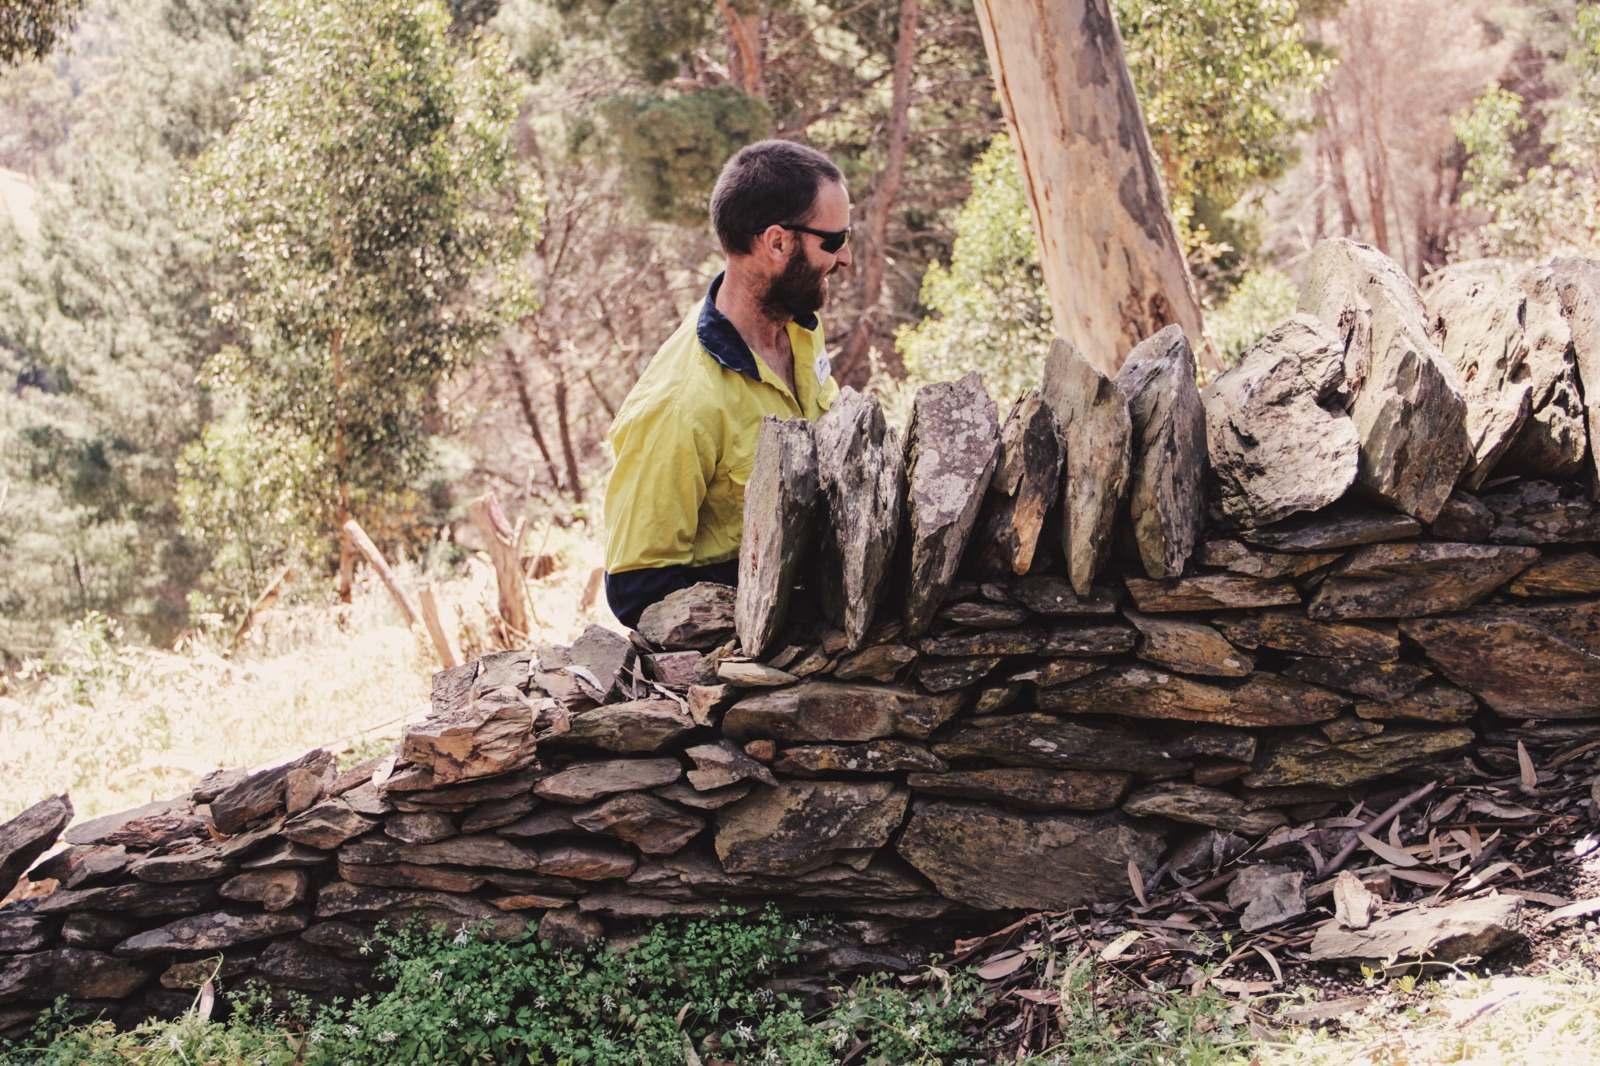 JRM Stonework, Adelaide, South Australia